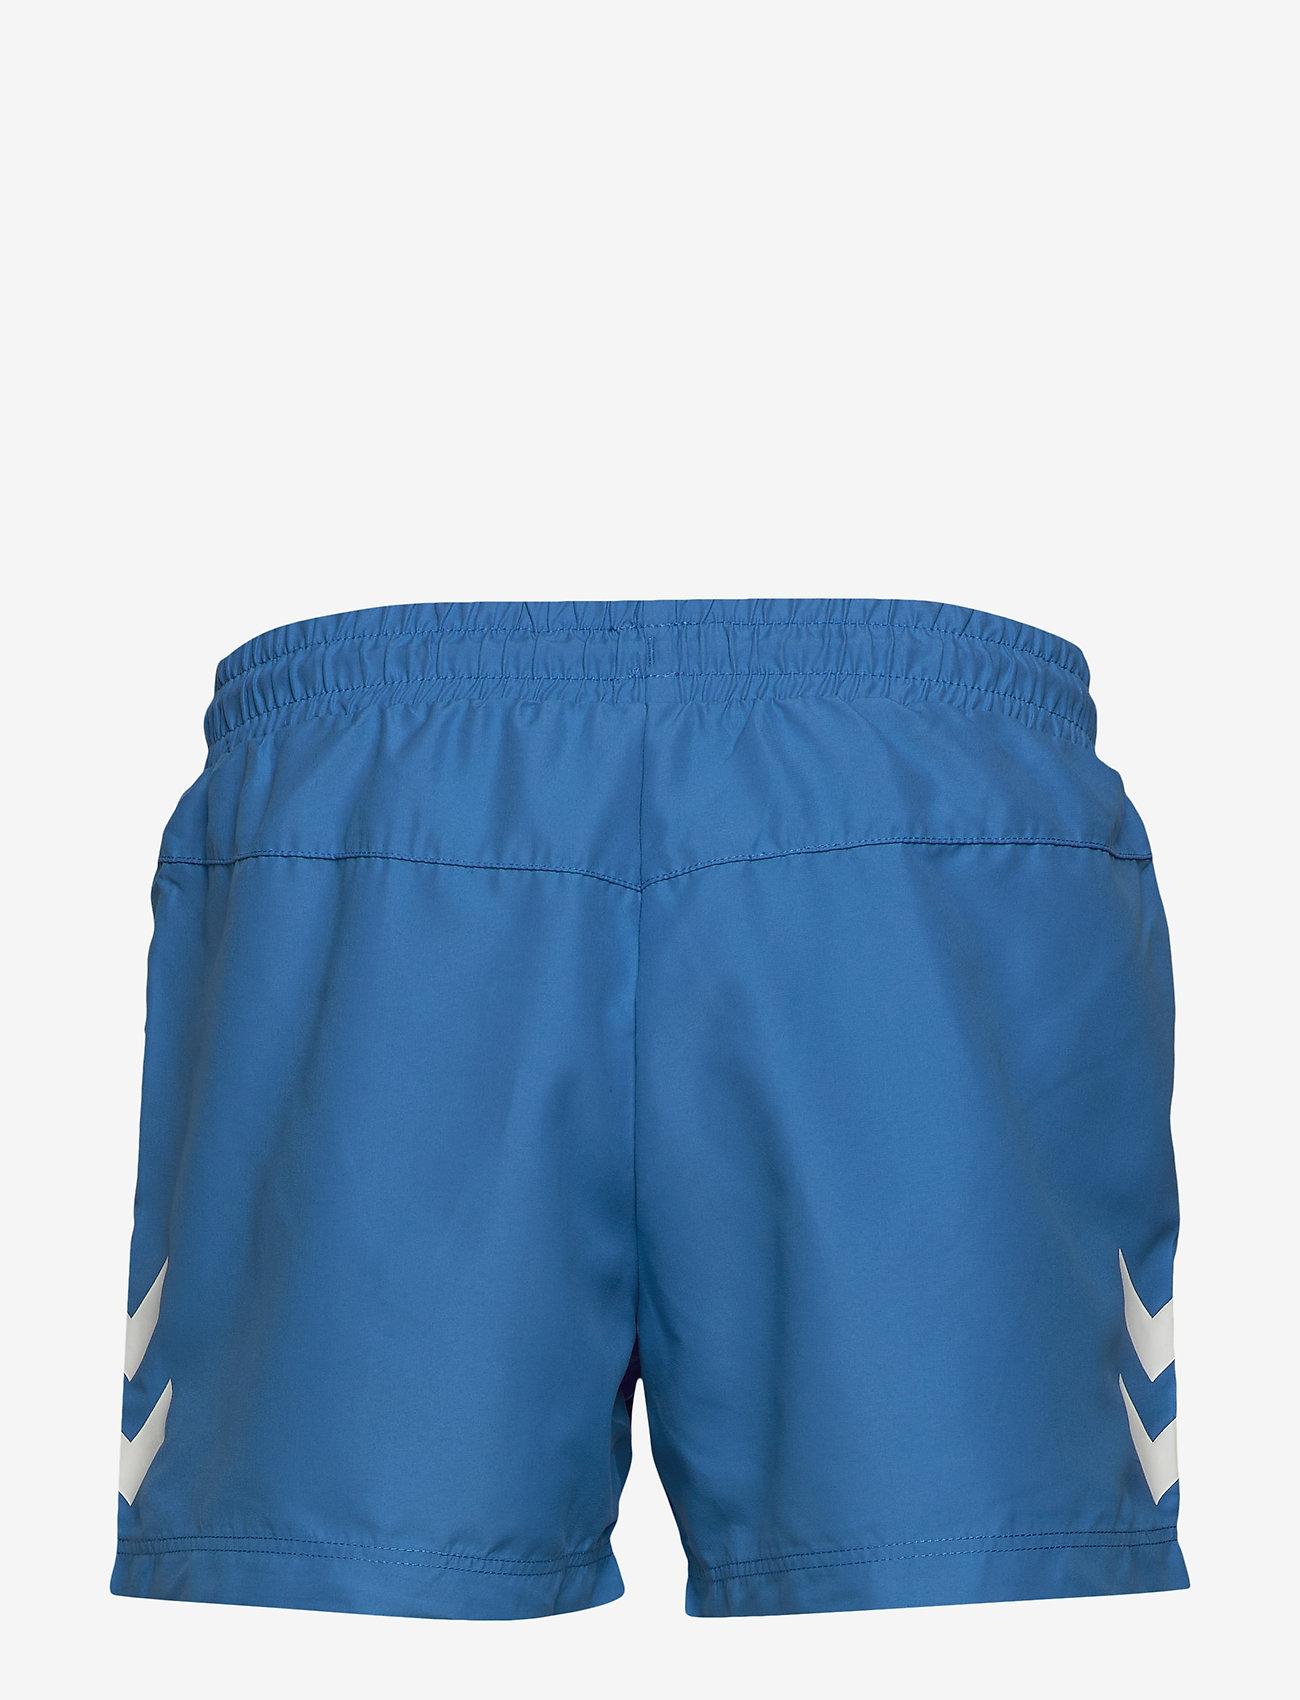 Hummel - hmlRENCE BOARD SHORTS - shorts - brilliant blue - 1